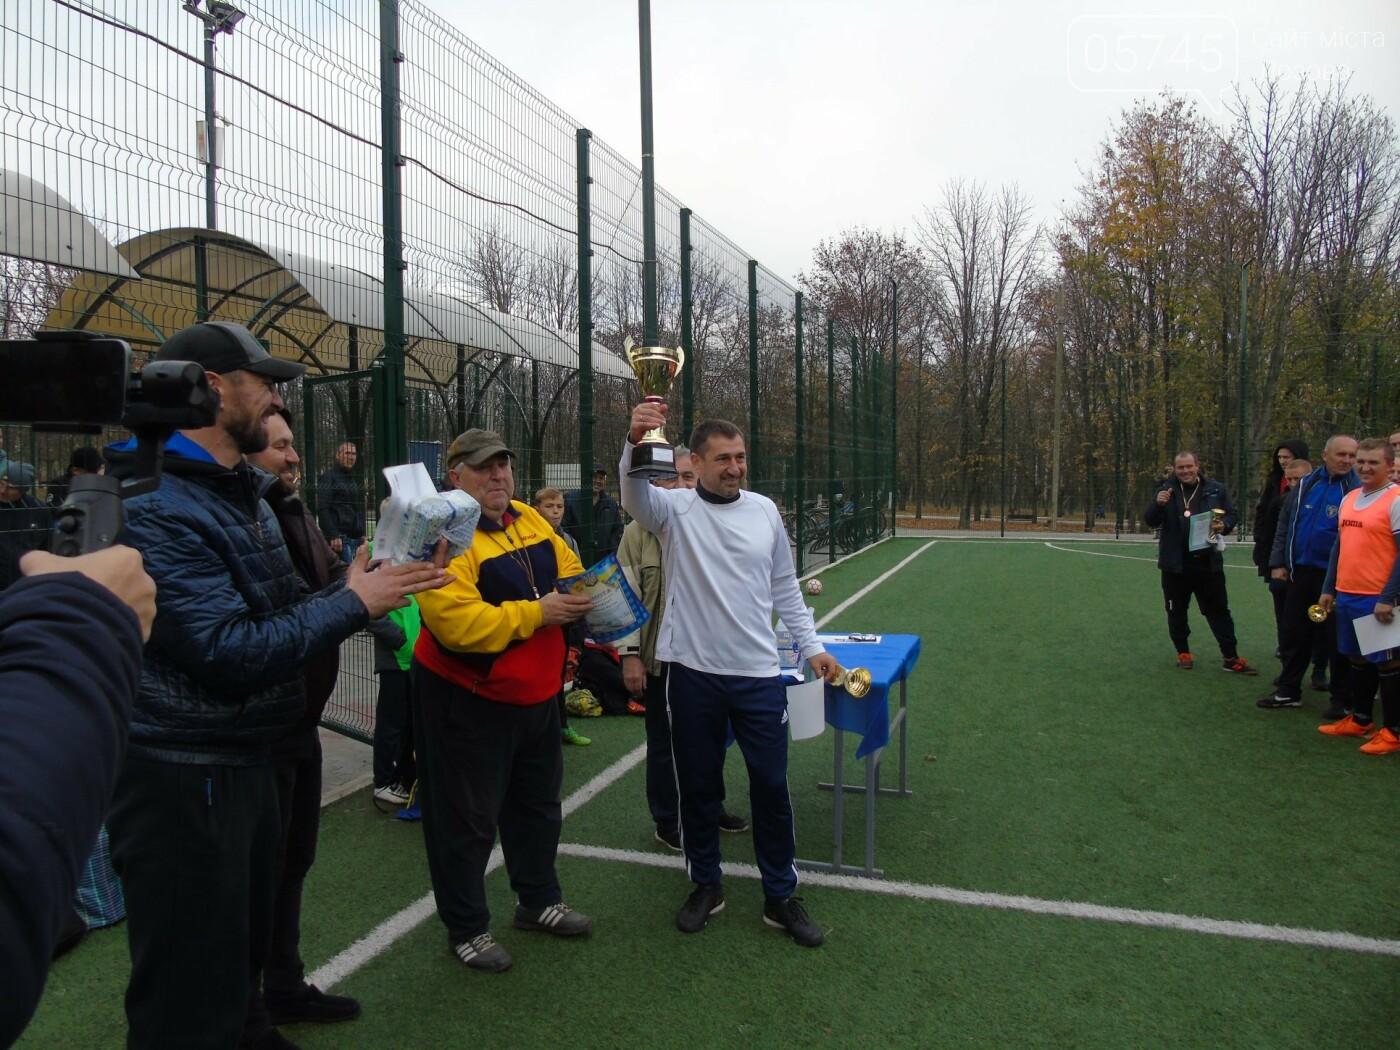 Лозовские аматорские команды разыграли Супер-кубок города по мини-футболу 2019, фото-3